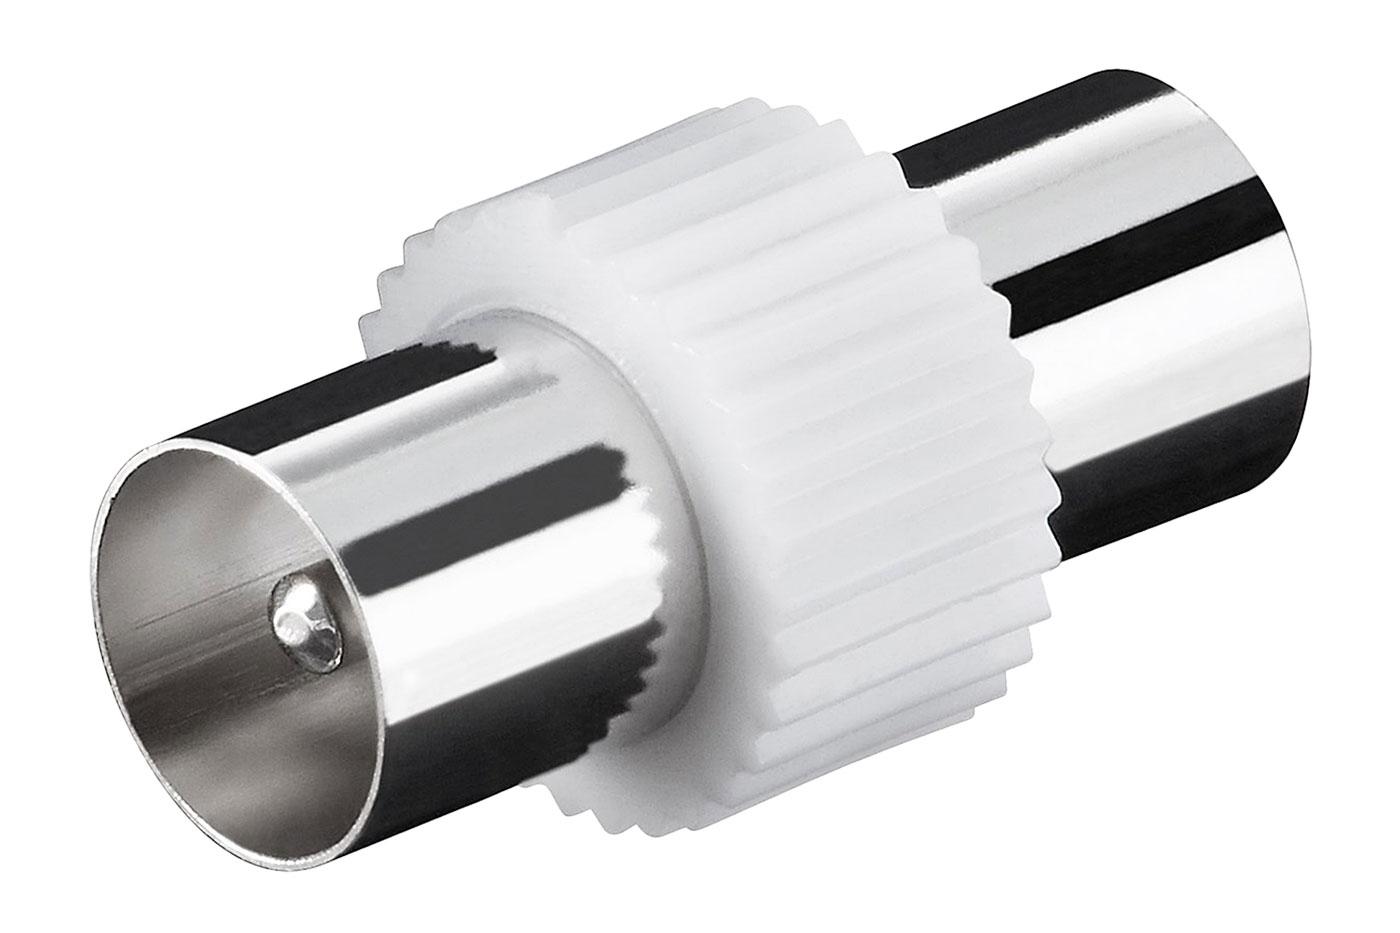 Adapter Koaxial-Buchse auf Koaxial-Buchse